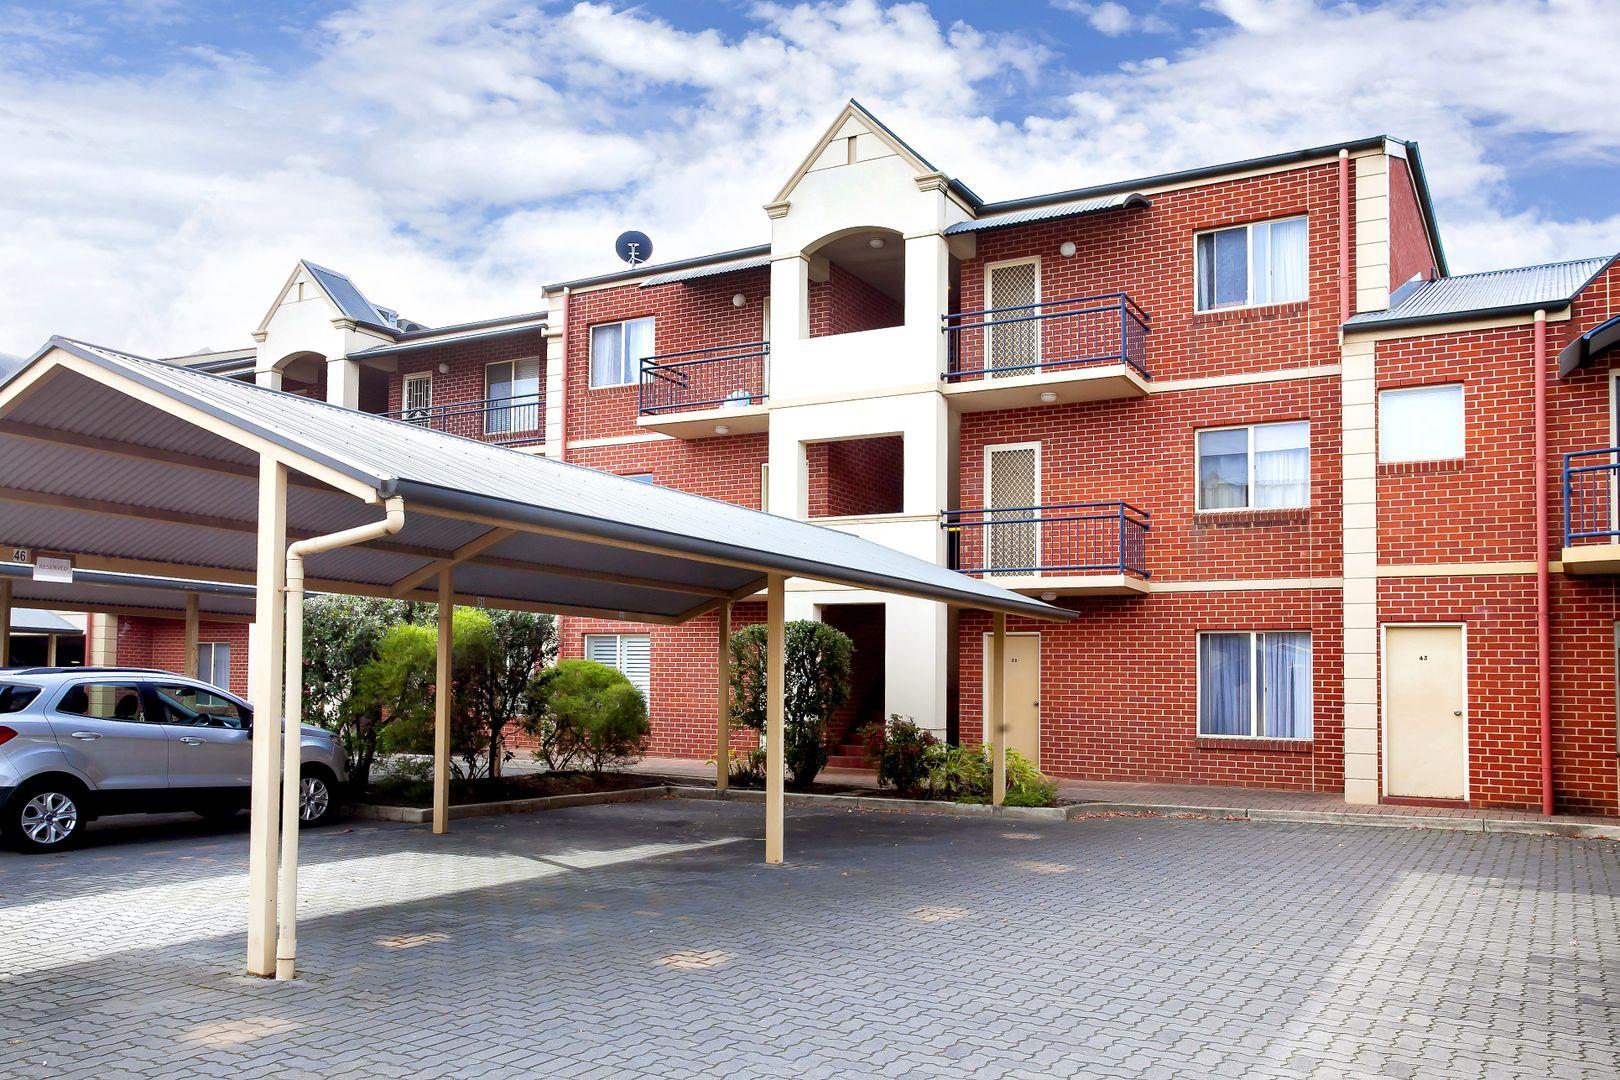 32/55 Melbourne Street, North Adelaide SA 5006, Image 0